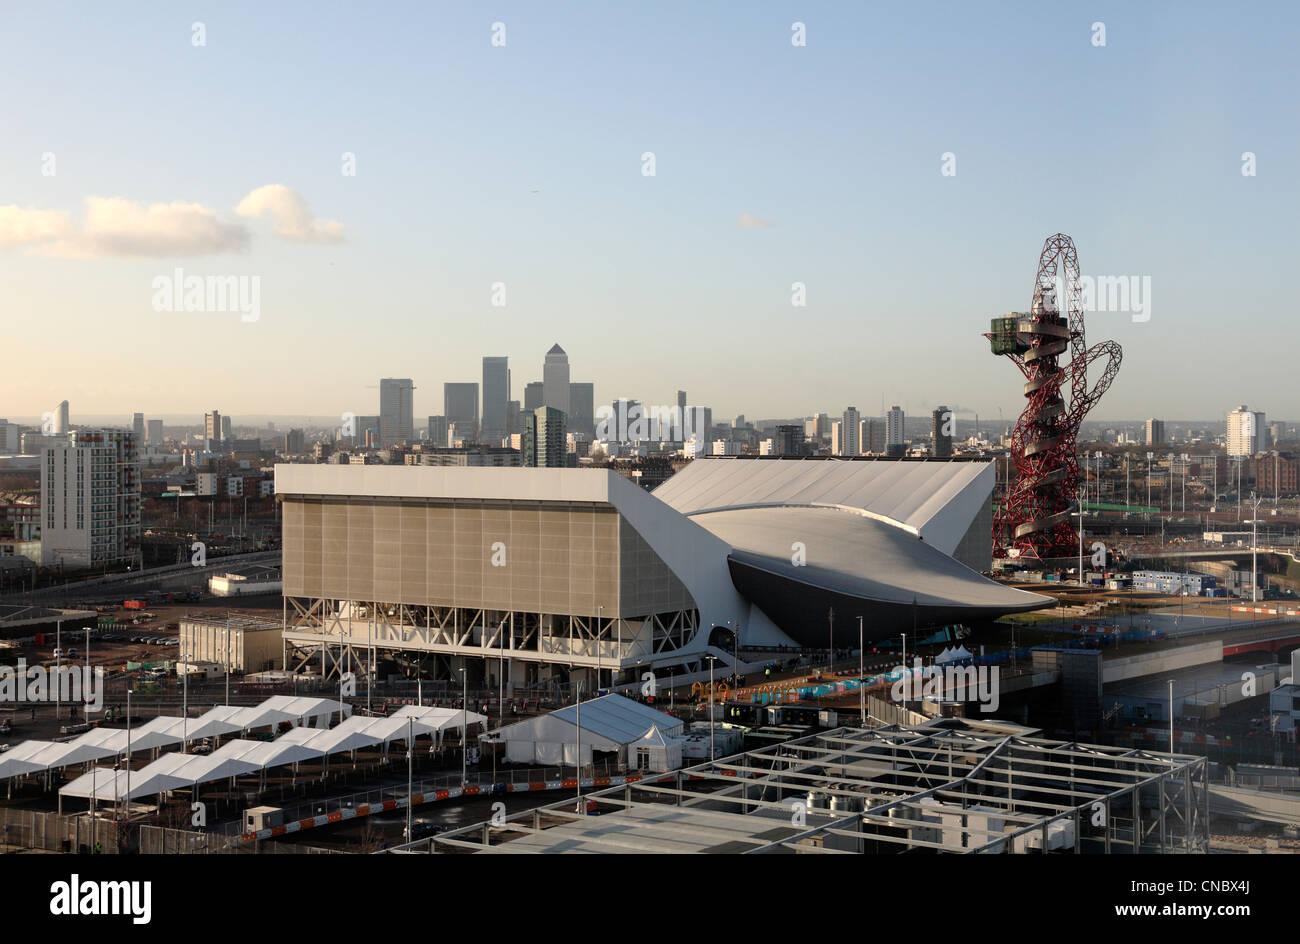 Aquatic centre center Olympic stadium games park Stratford London 2012 Olympics - Stock Image